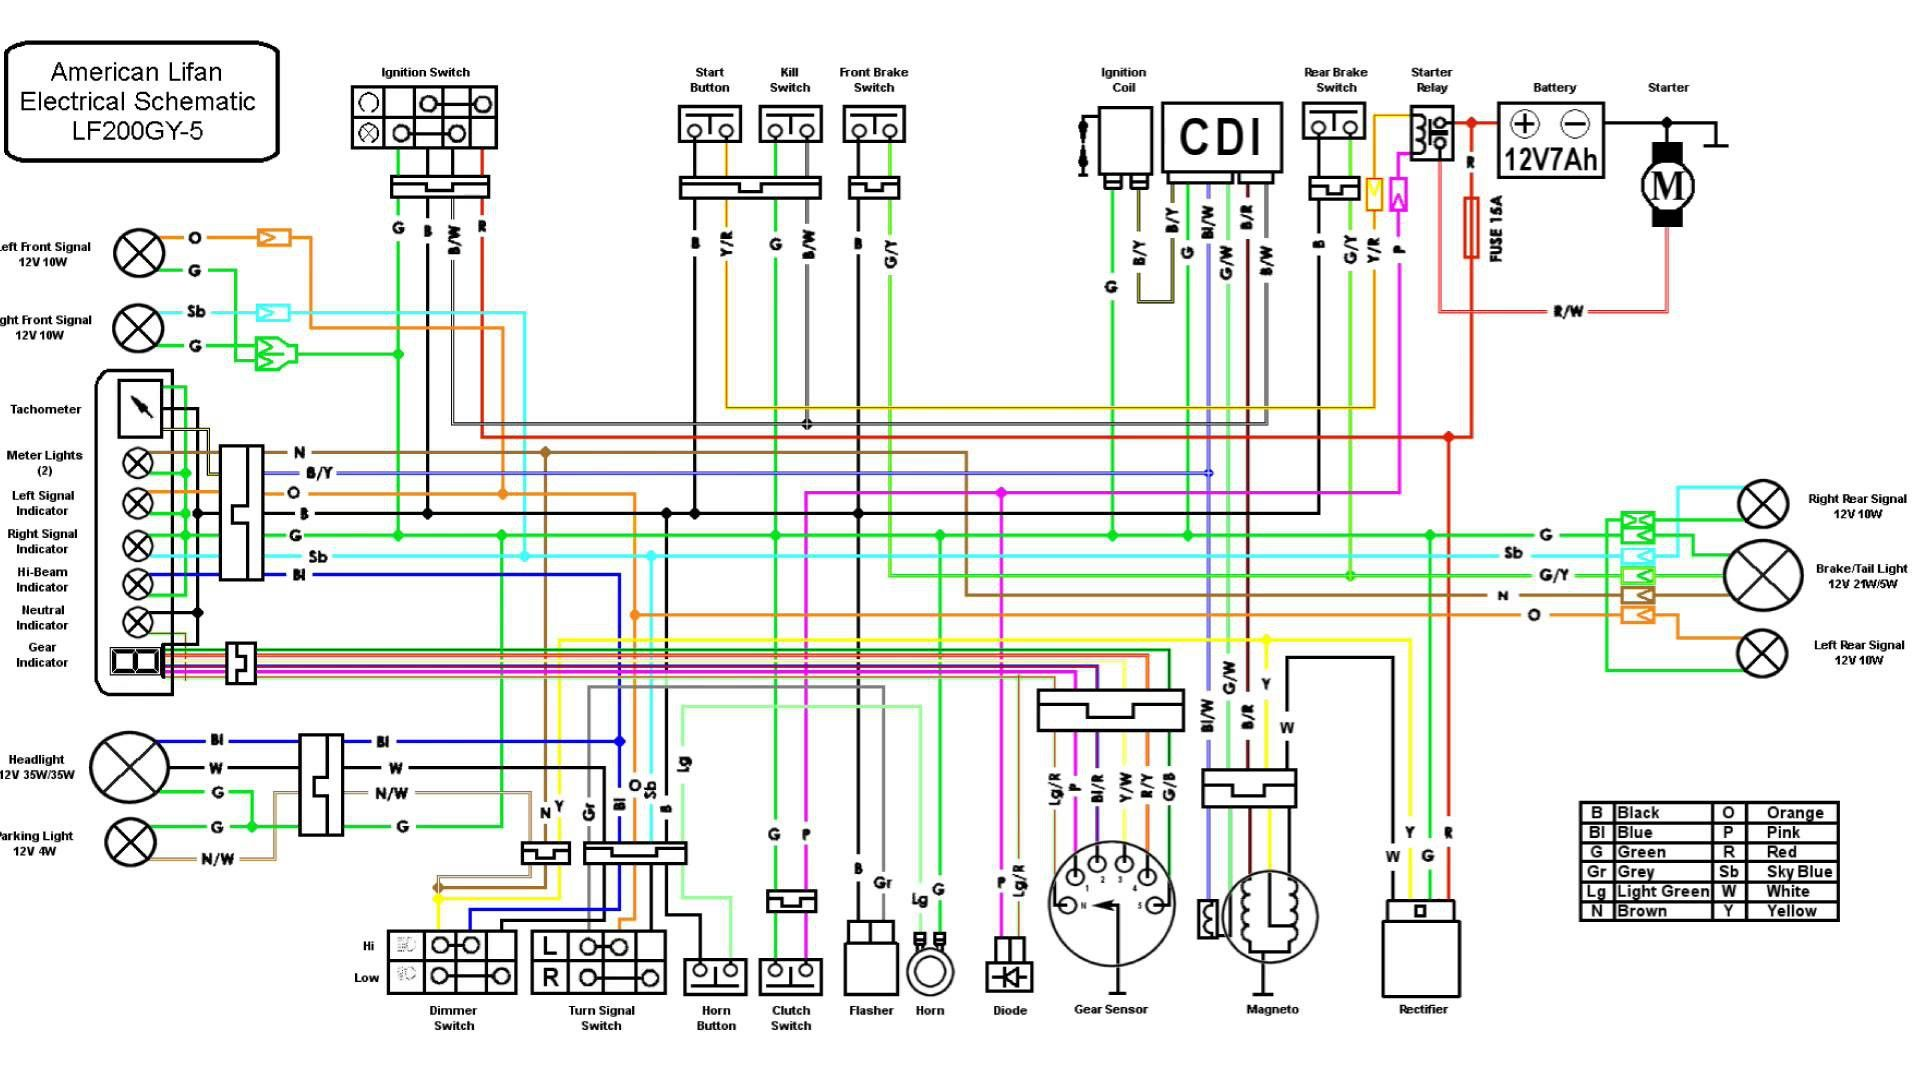 wiring harness diagram lovely 200cc lifan wiring diagram [ 1920 x 1080 Pixel ]